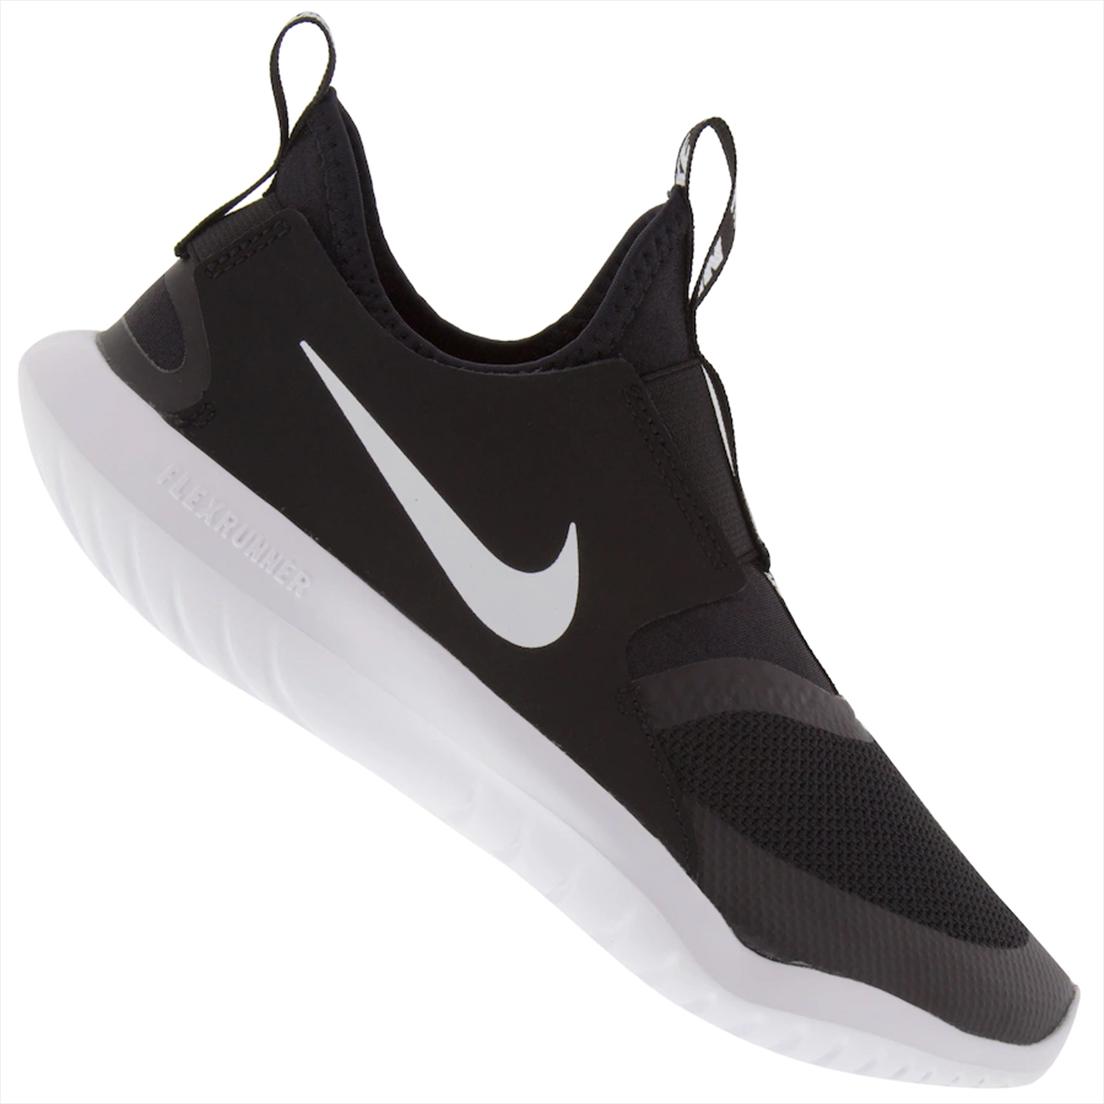 Tênis Infantil Nike Flex Runner PS - Preto+Branco